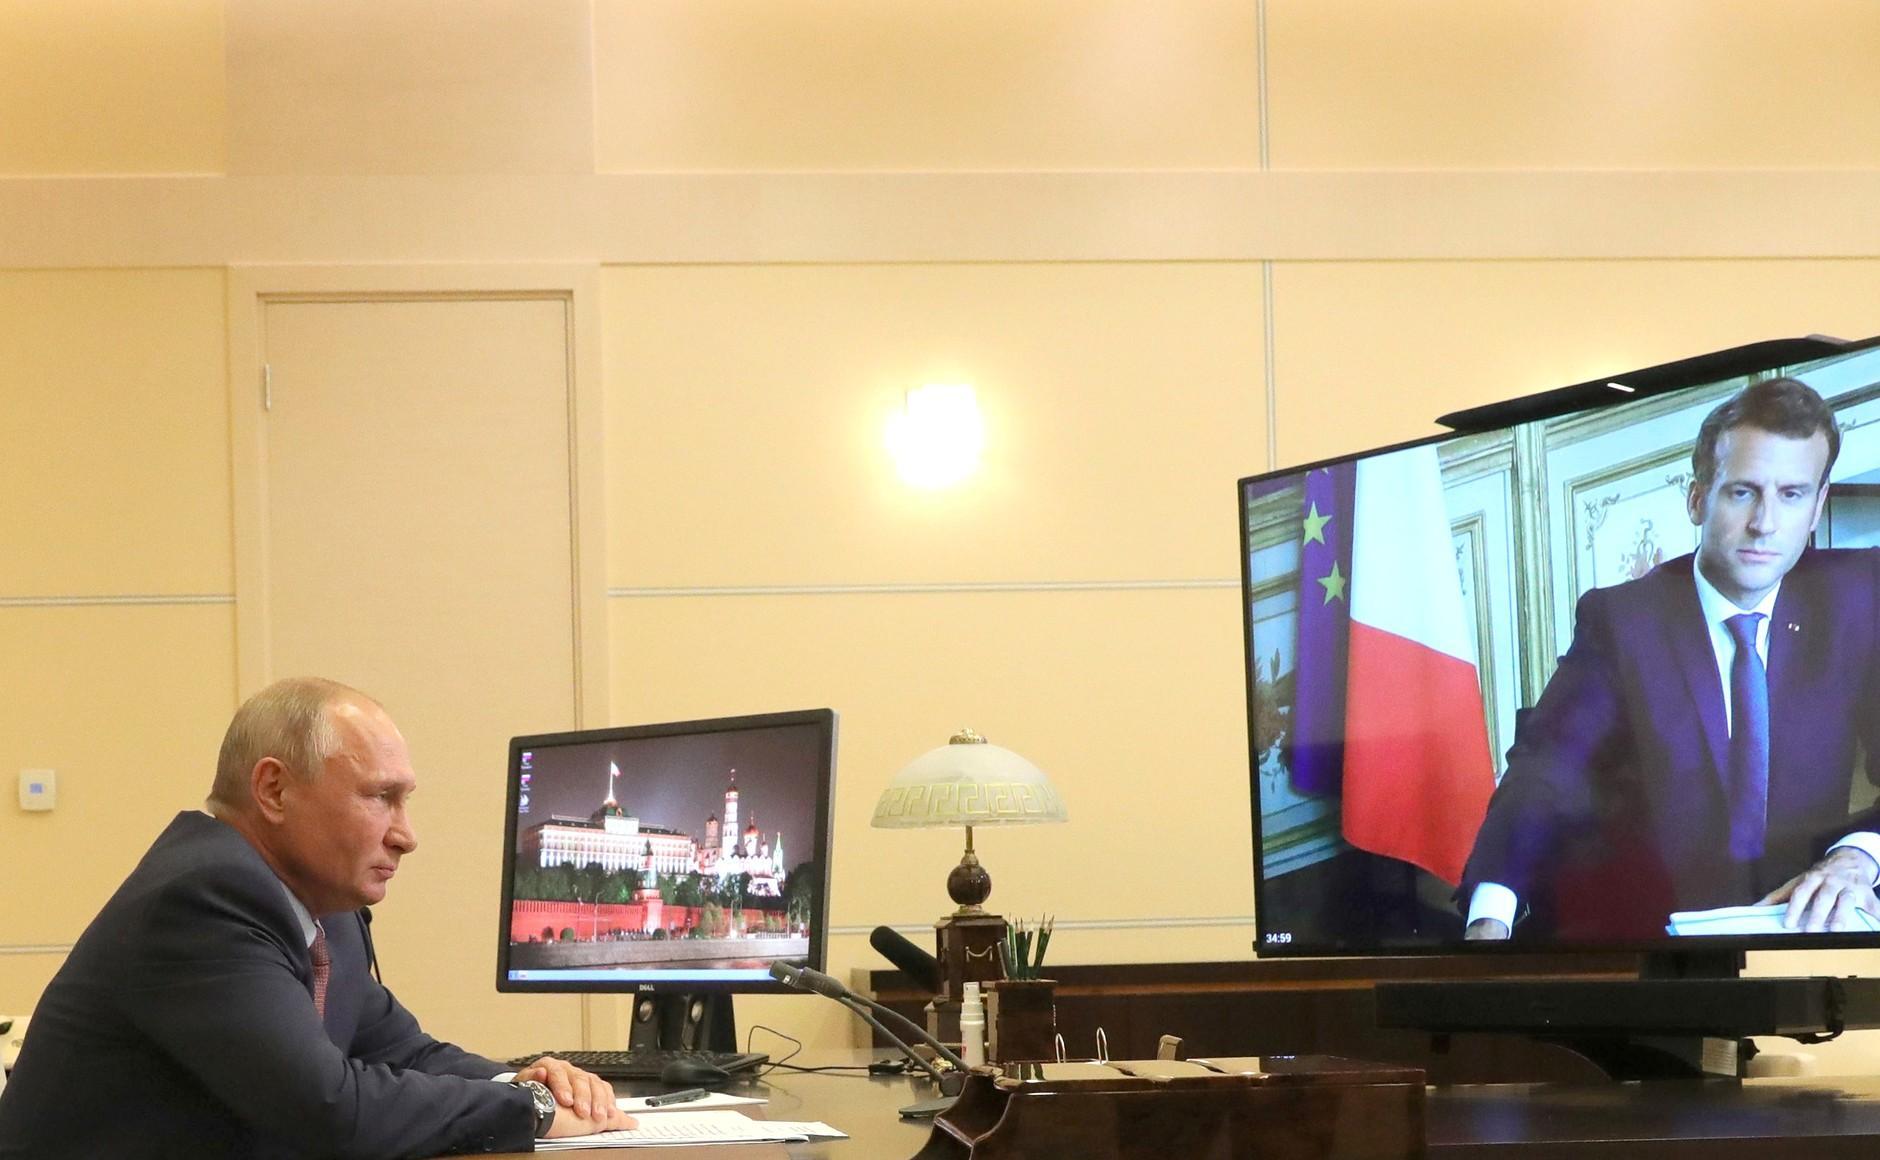 <p>Президент РФ Владимир Путин и президент Франции Эмманюэль Макрон. Фото © Kremlin</p>